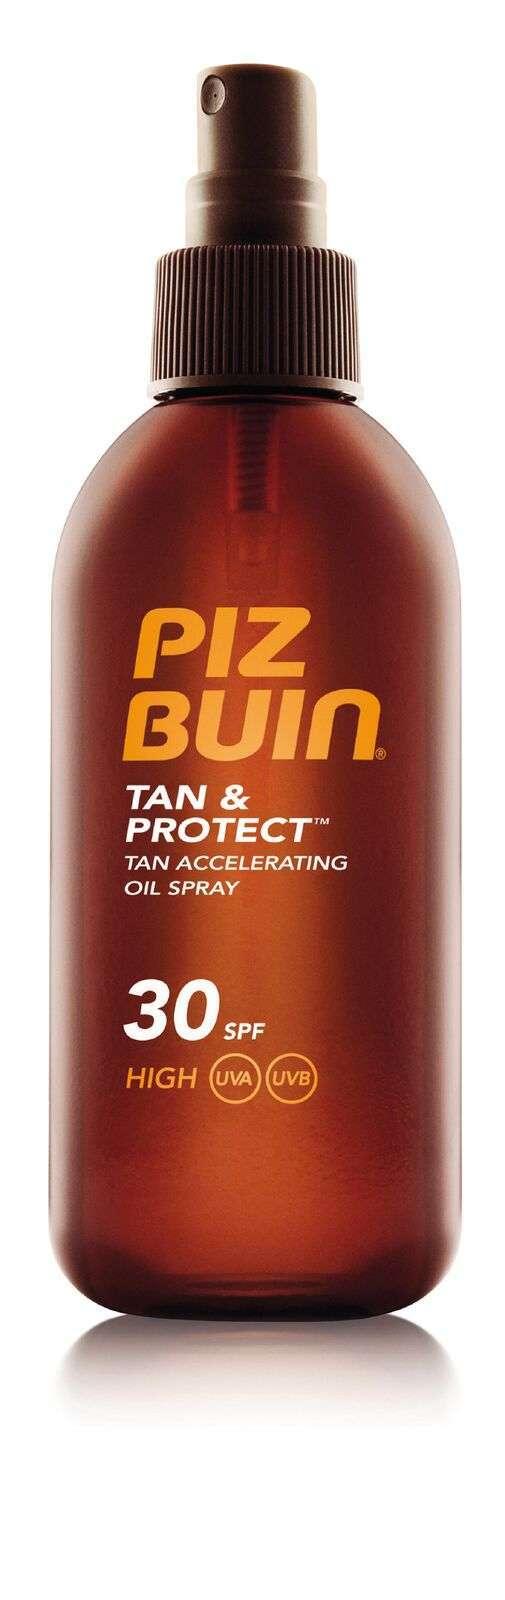 Piz Buin, Tan & Protect: Tan  accelerating oil spray